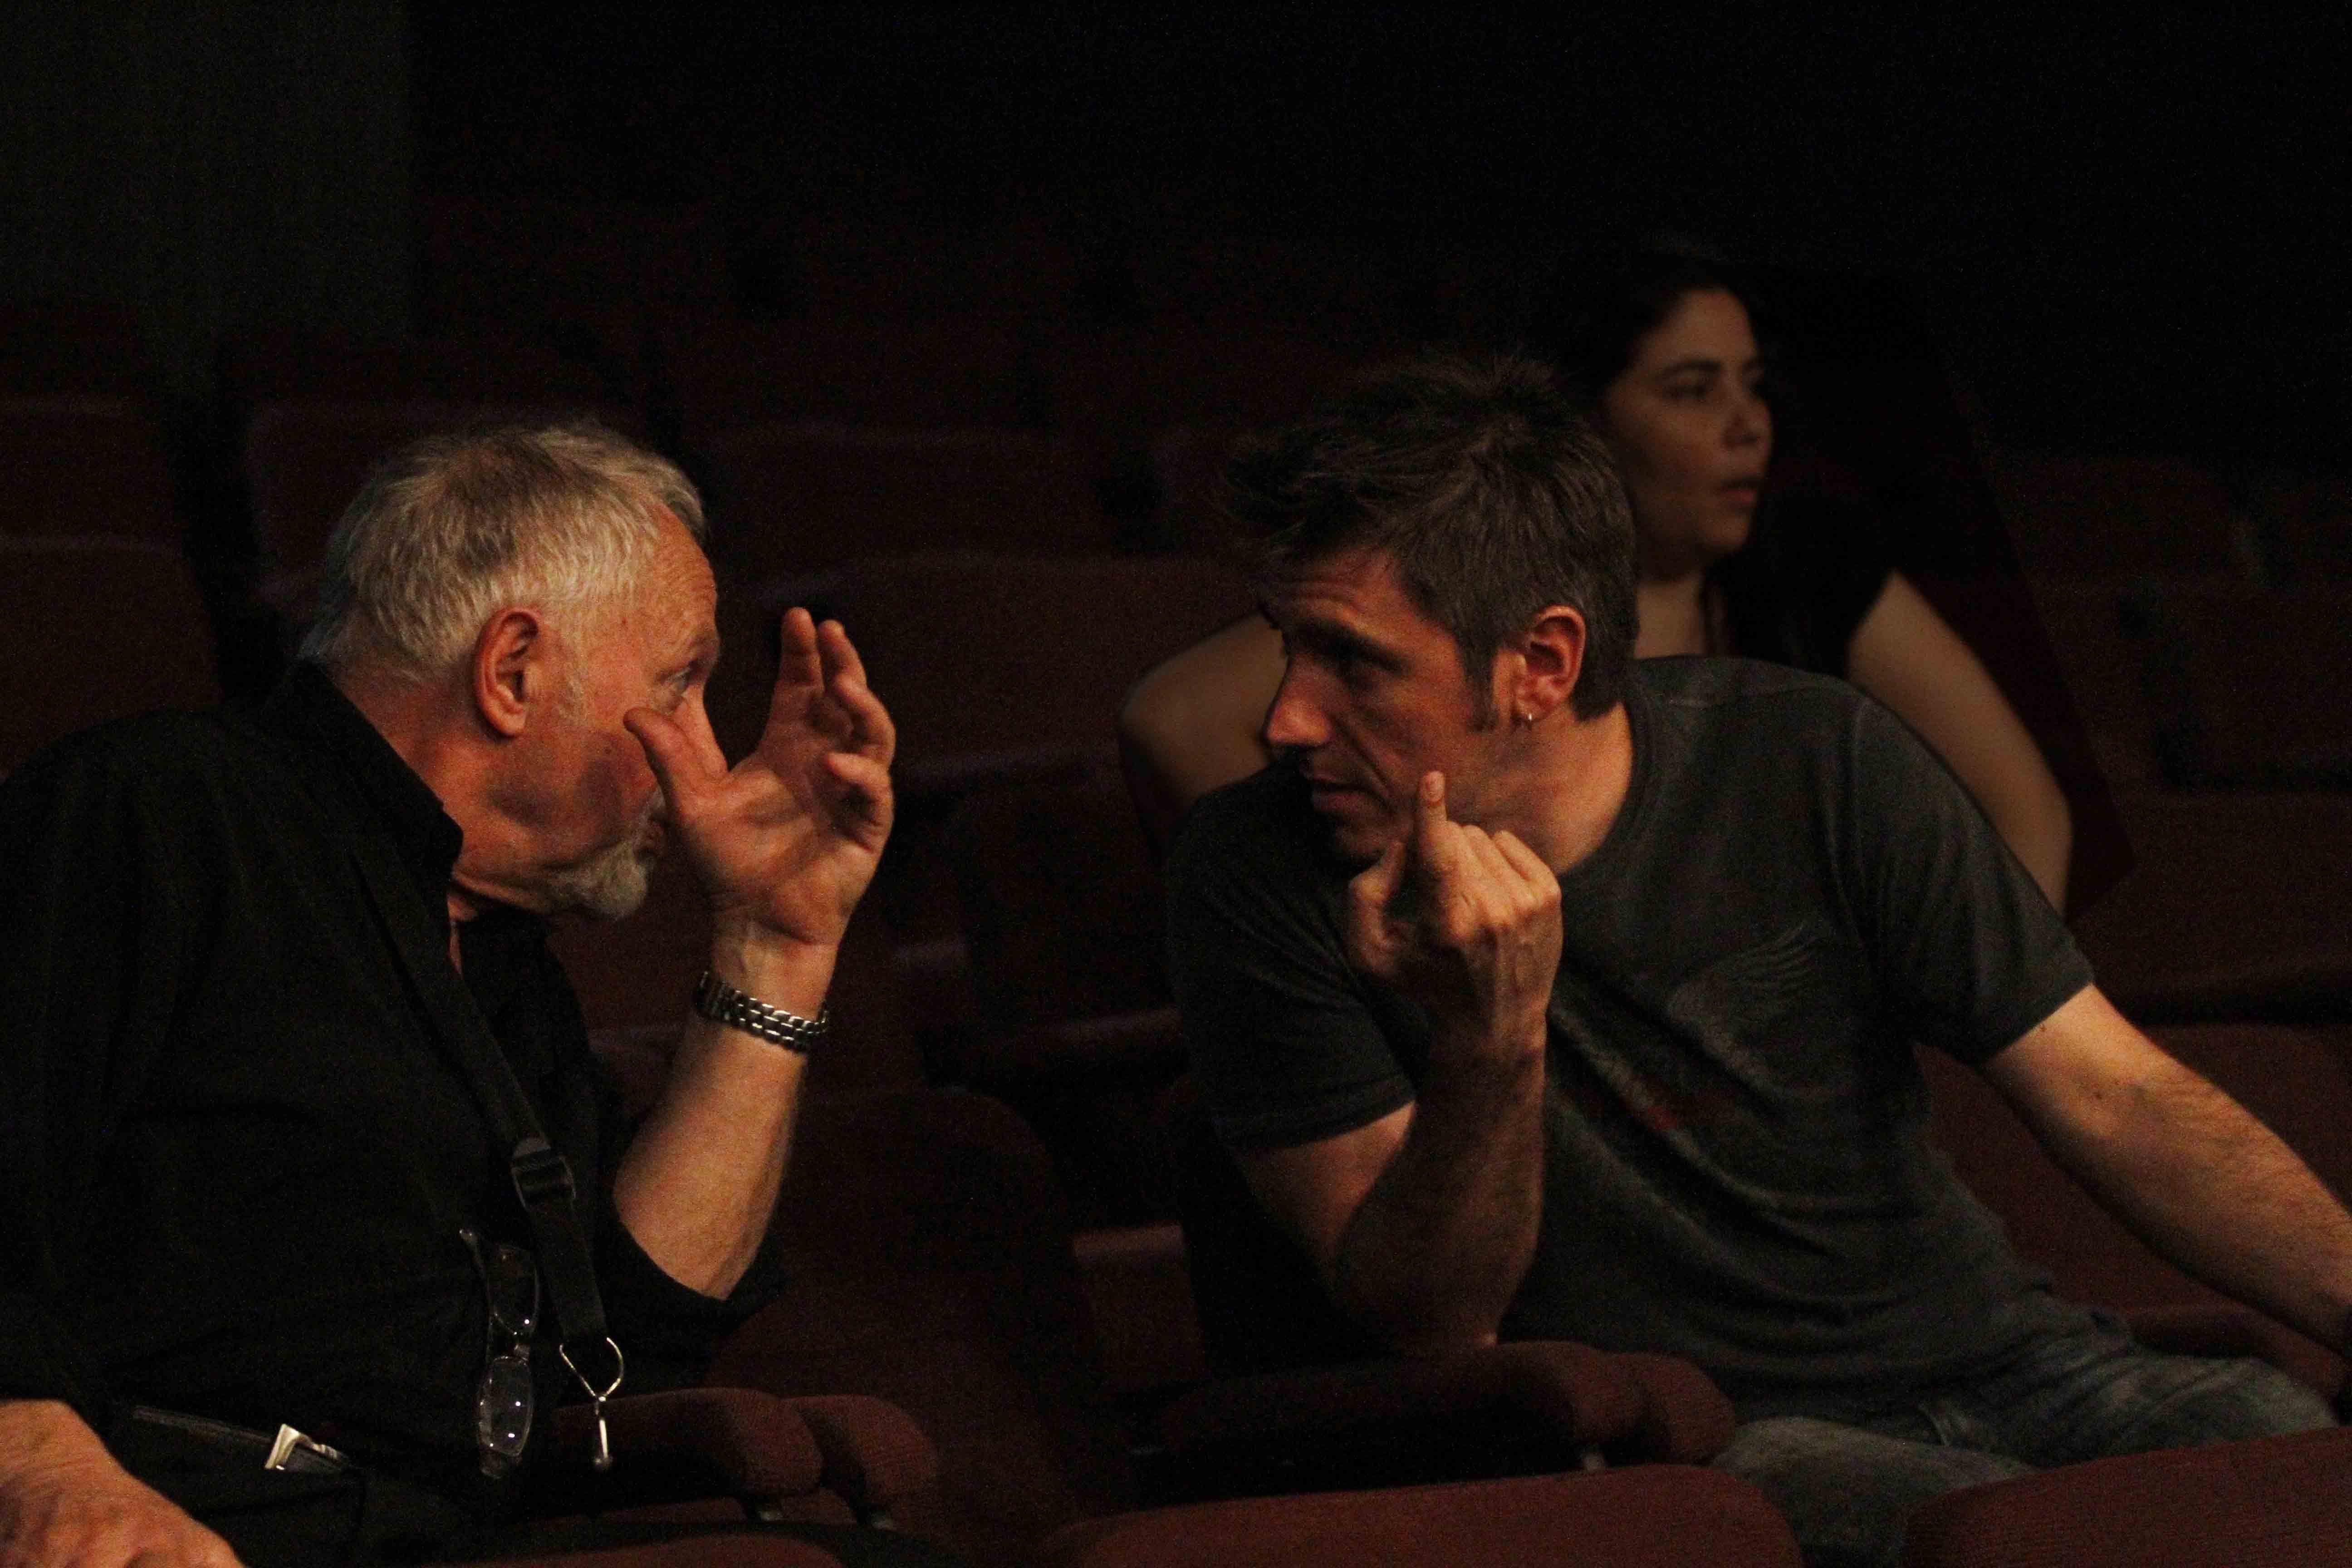 Ian Calamaro & Hector Costita